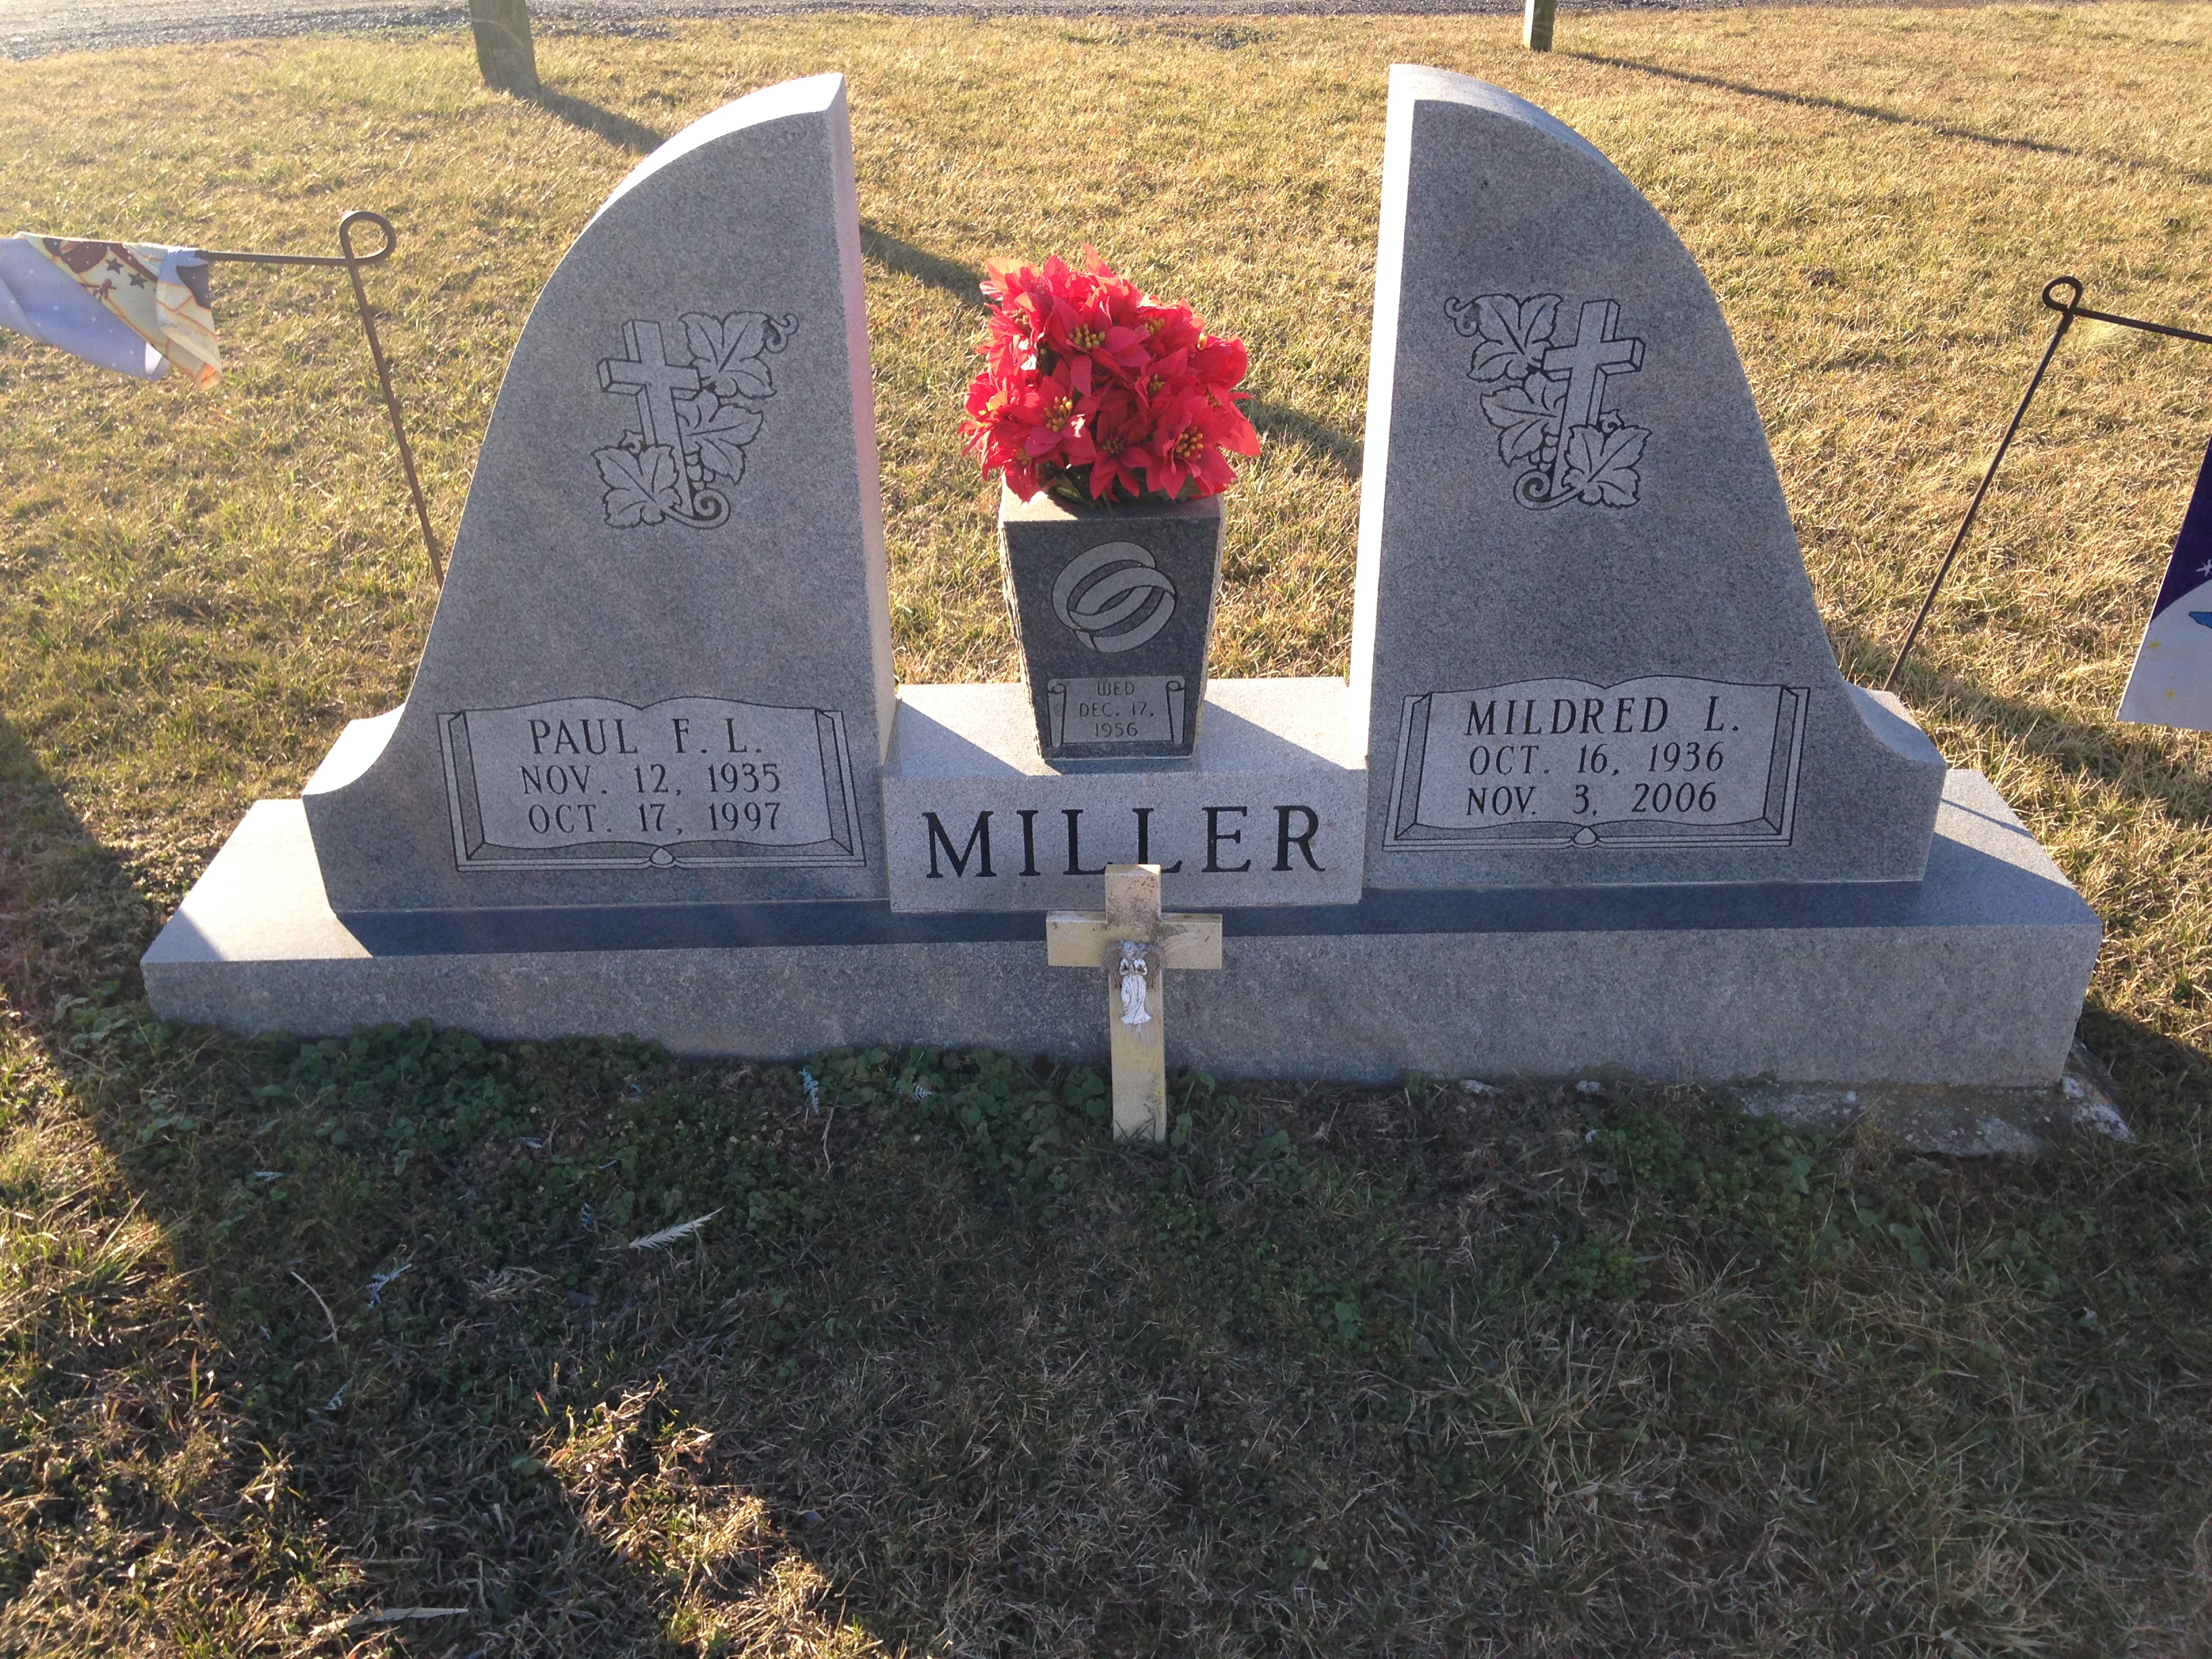 Paul F.L. Miller